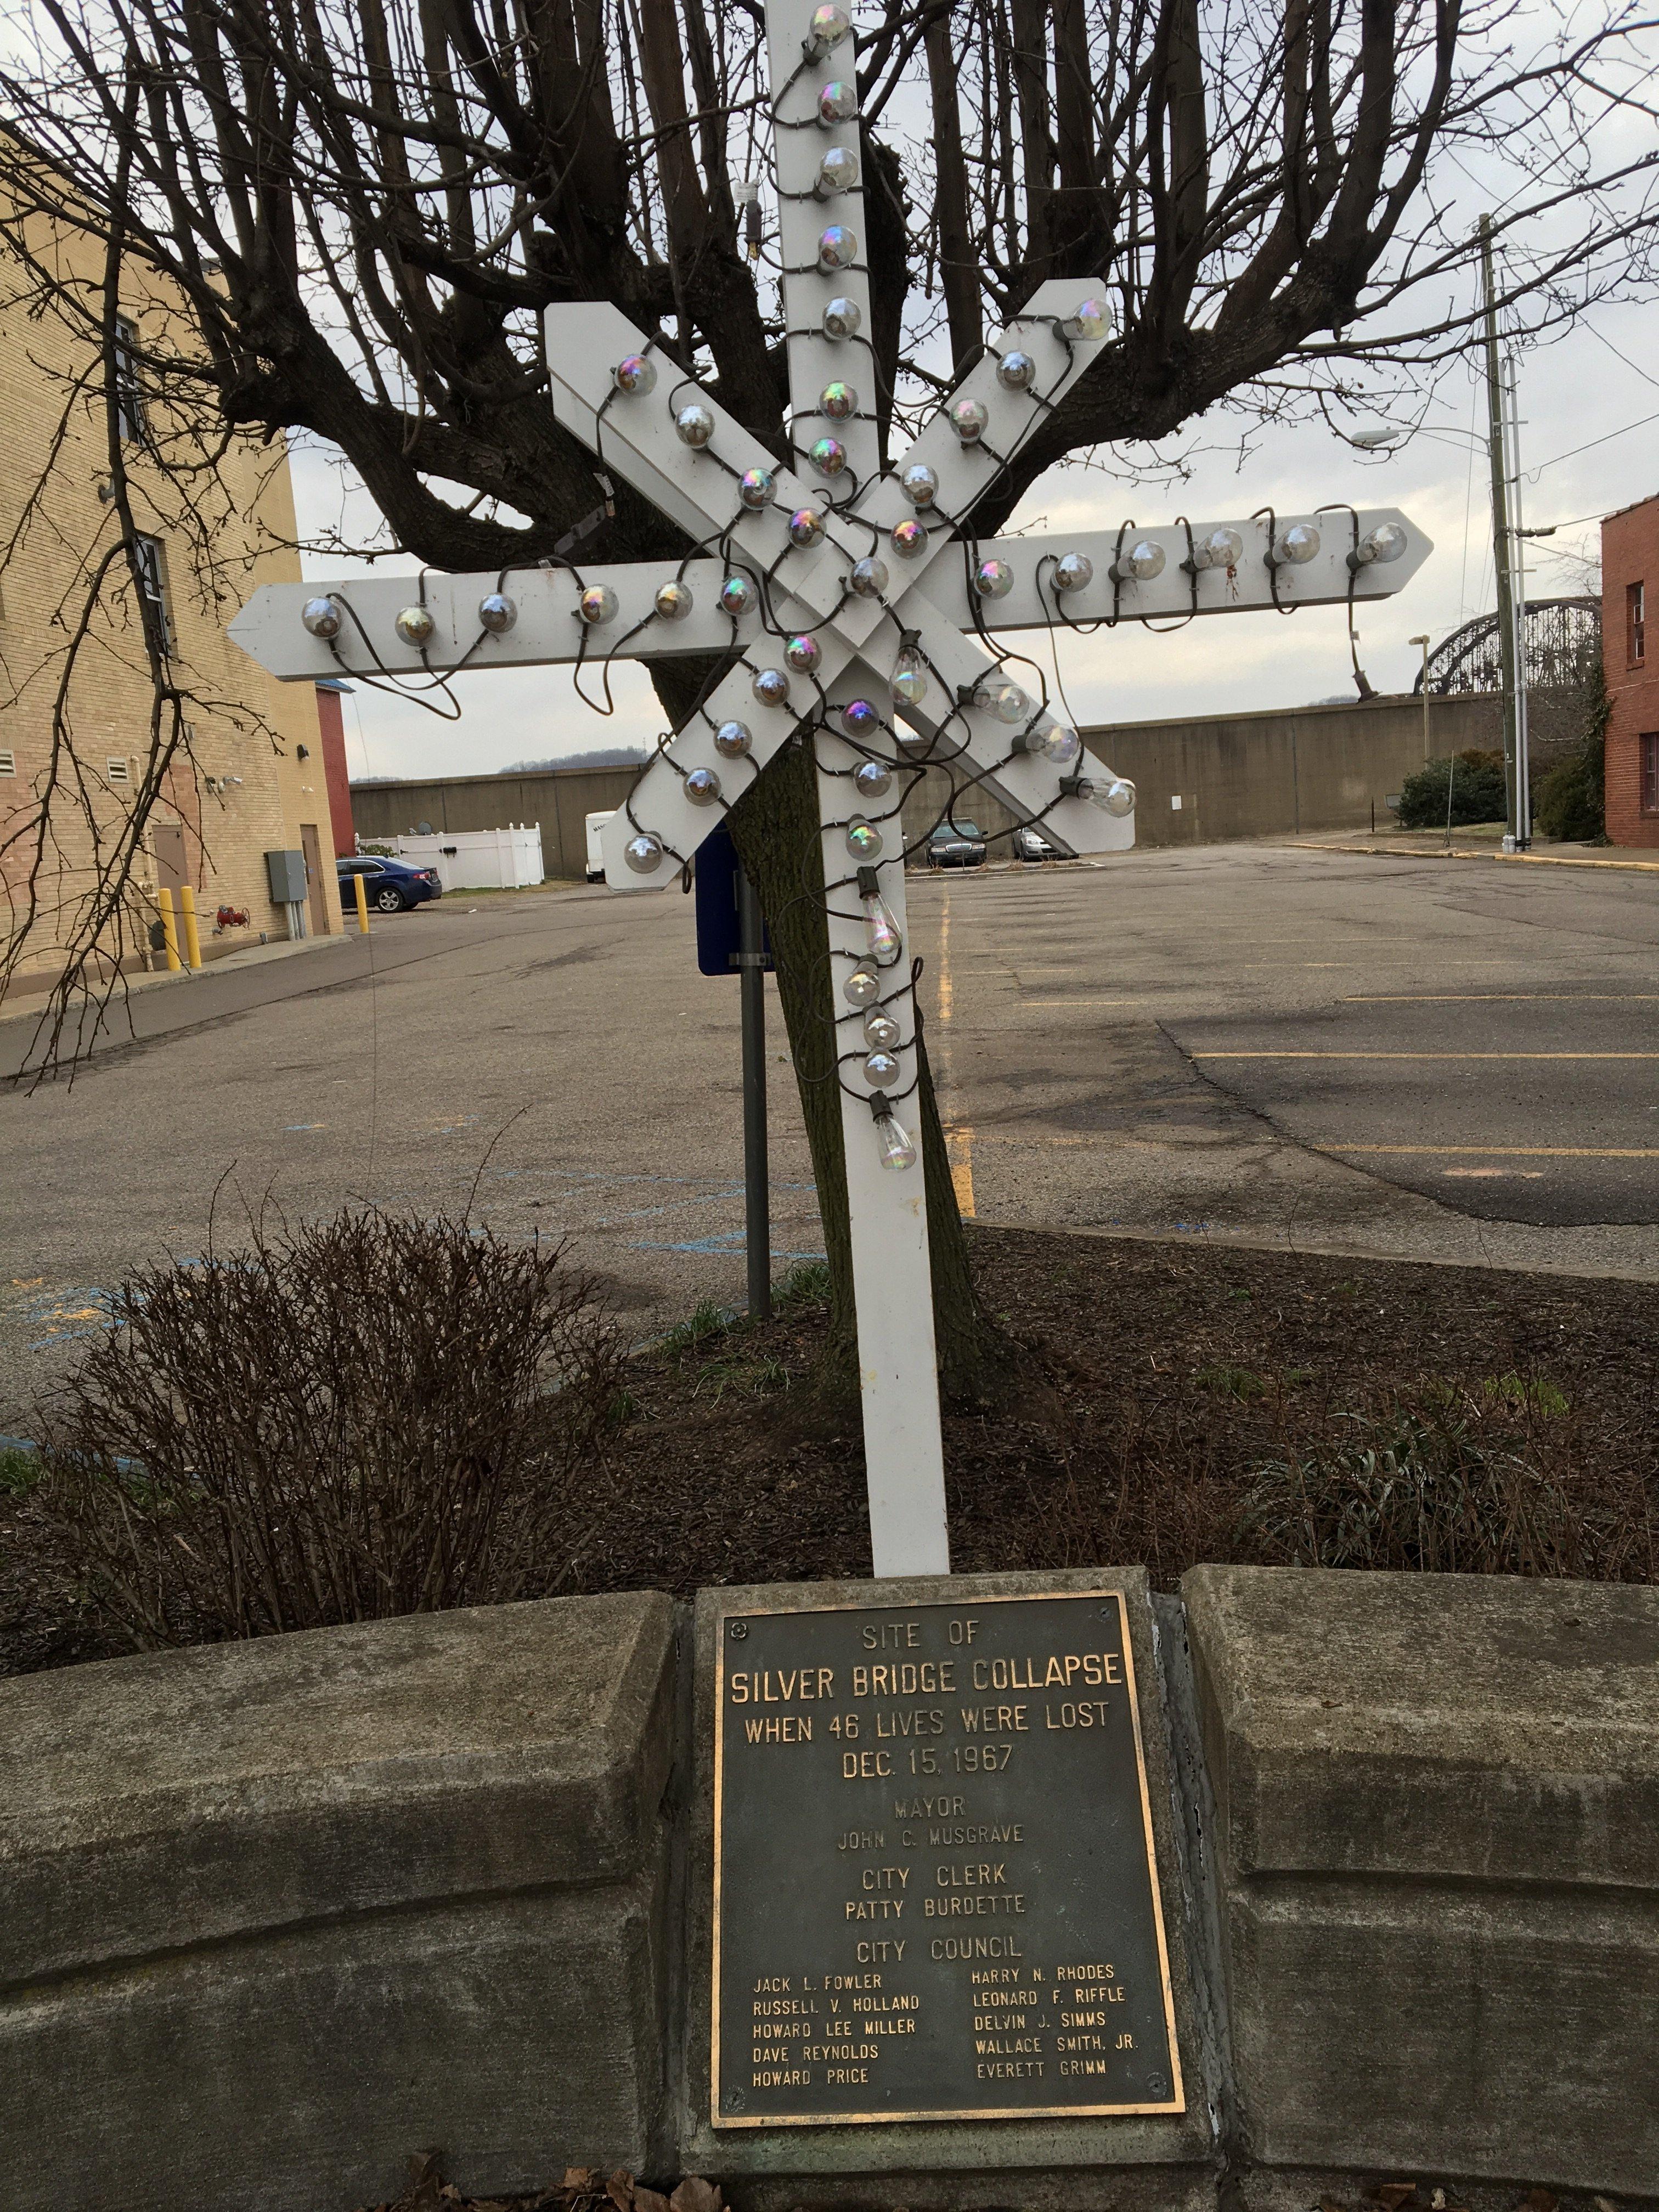 Cross above the Silver Bridge Dedication Plaque